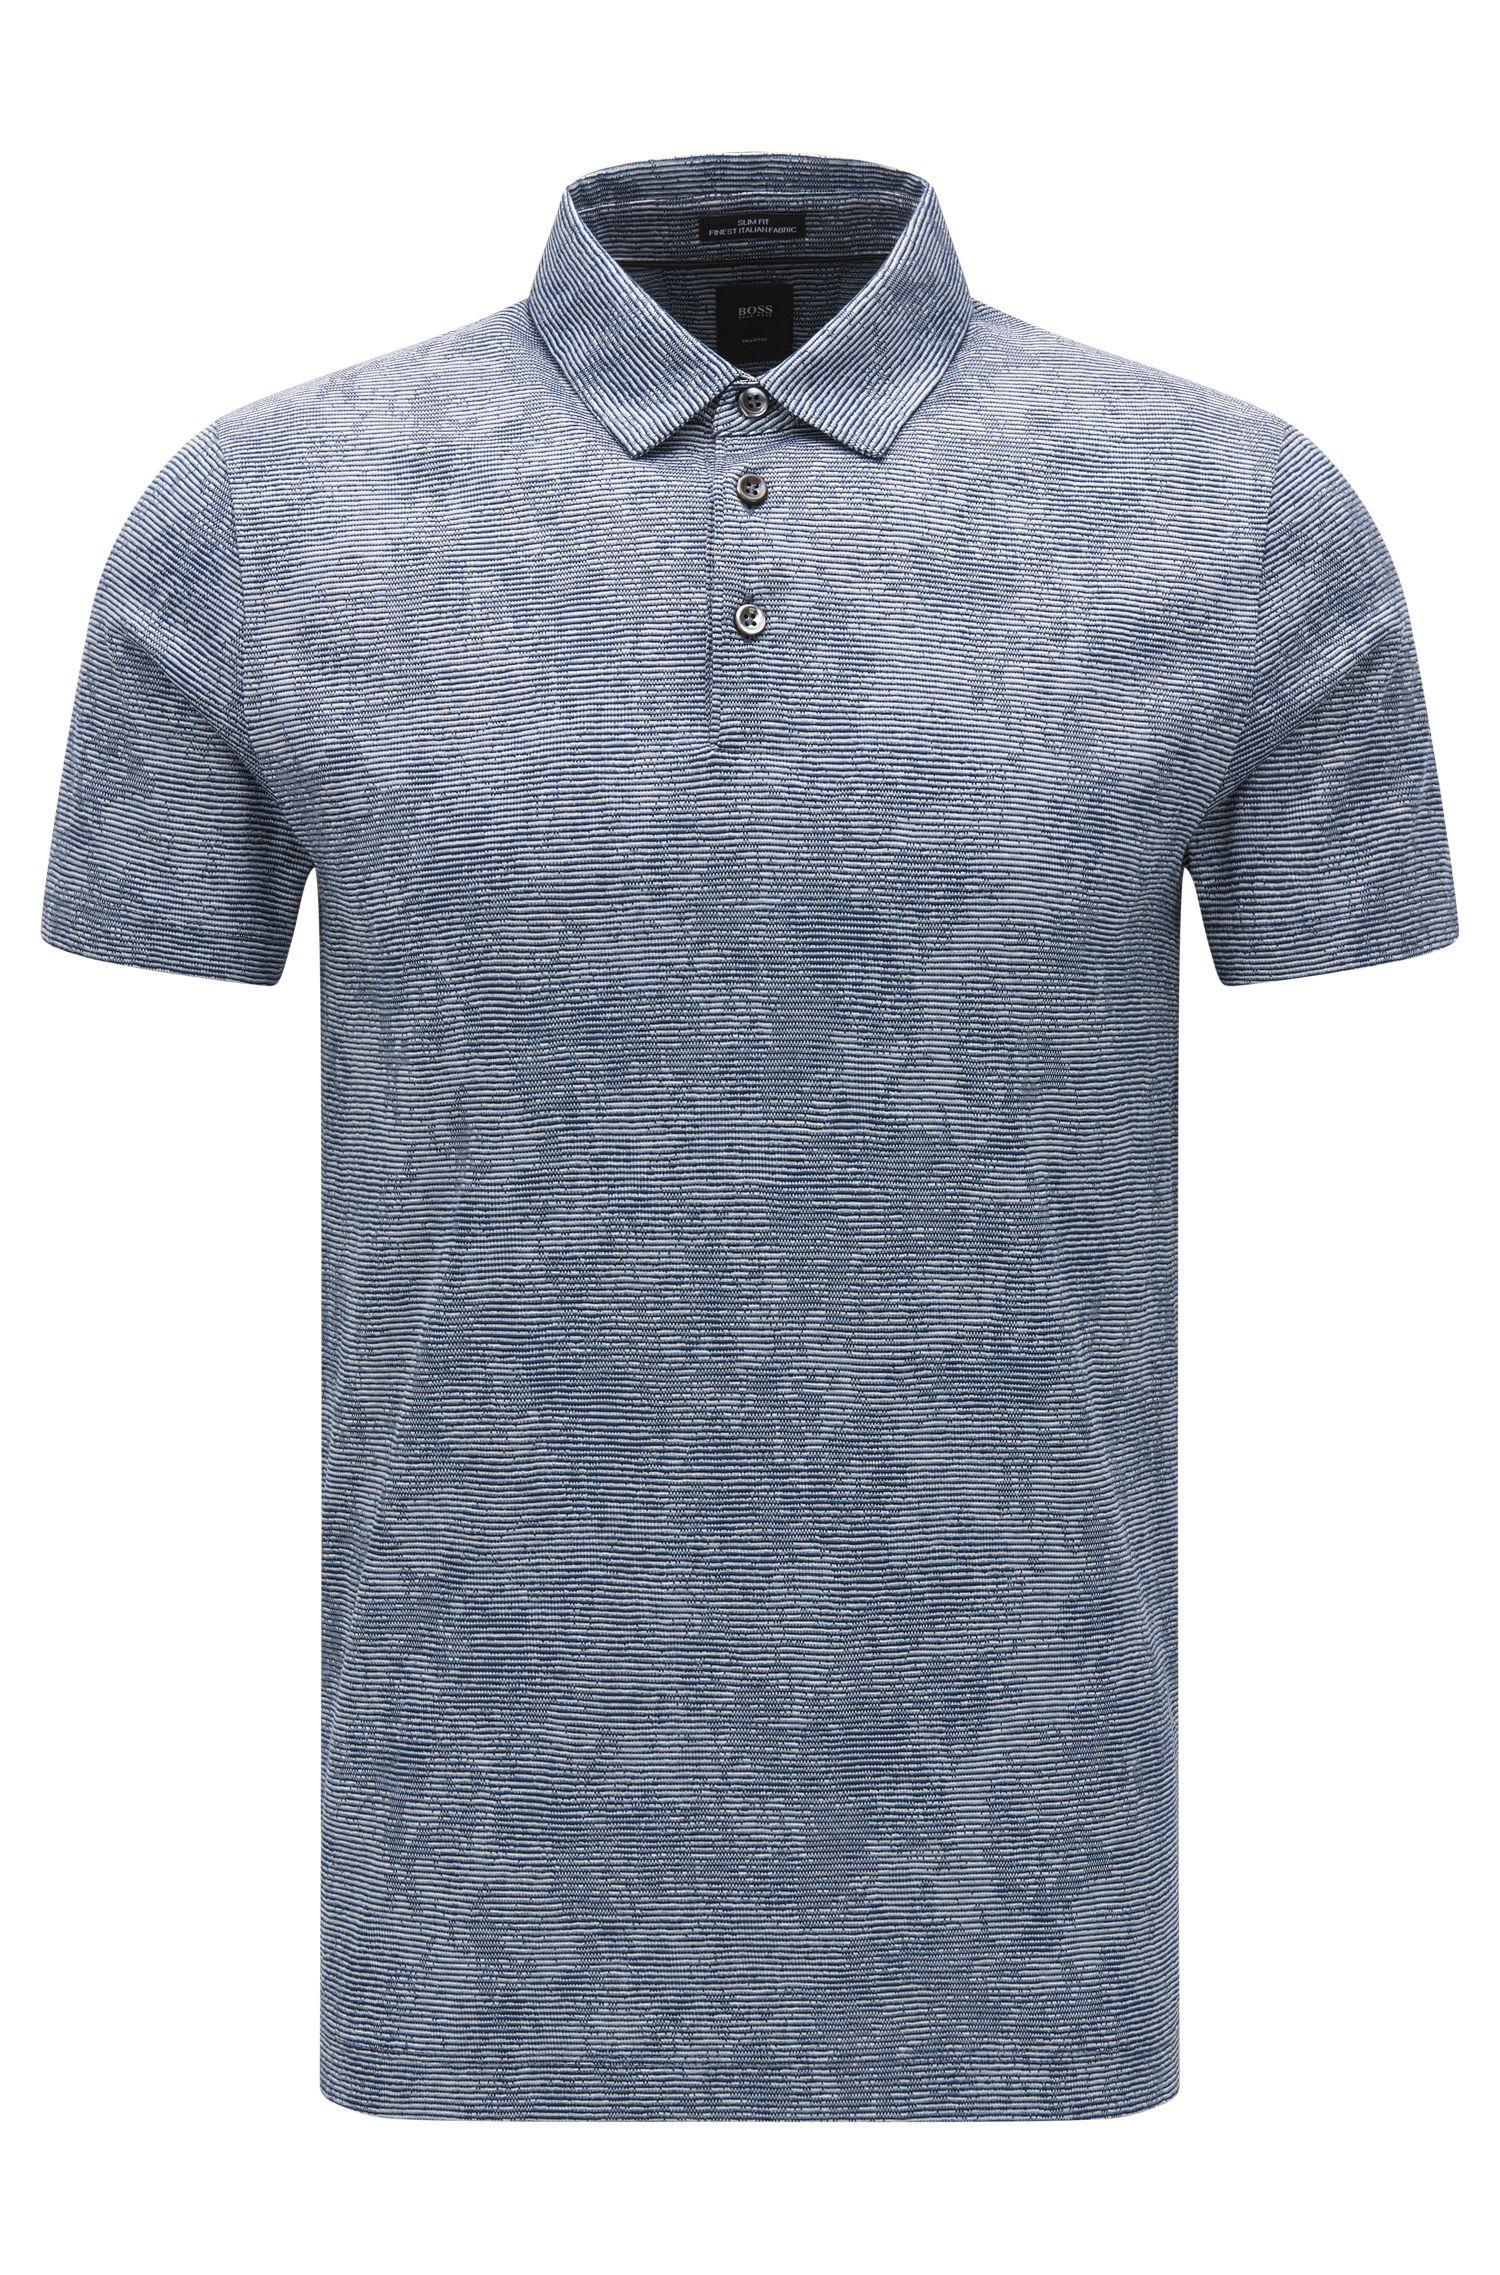 Slim-Fit Poloshirt aus Baumwolle mit Jacquard-Muster